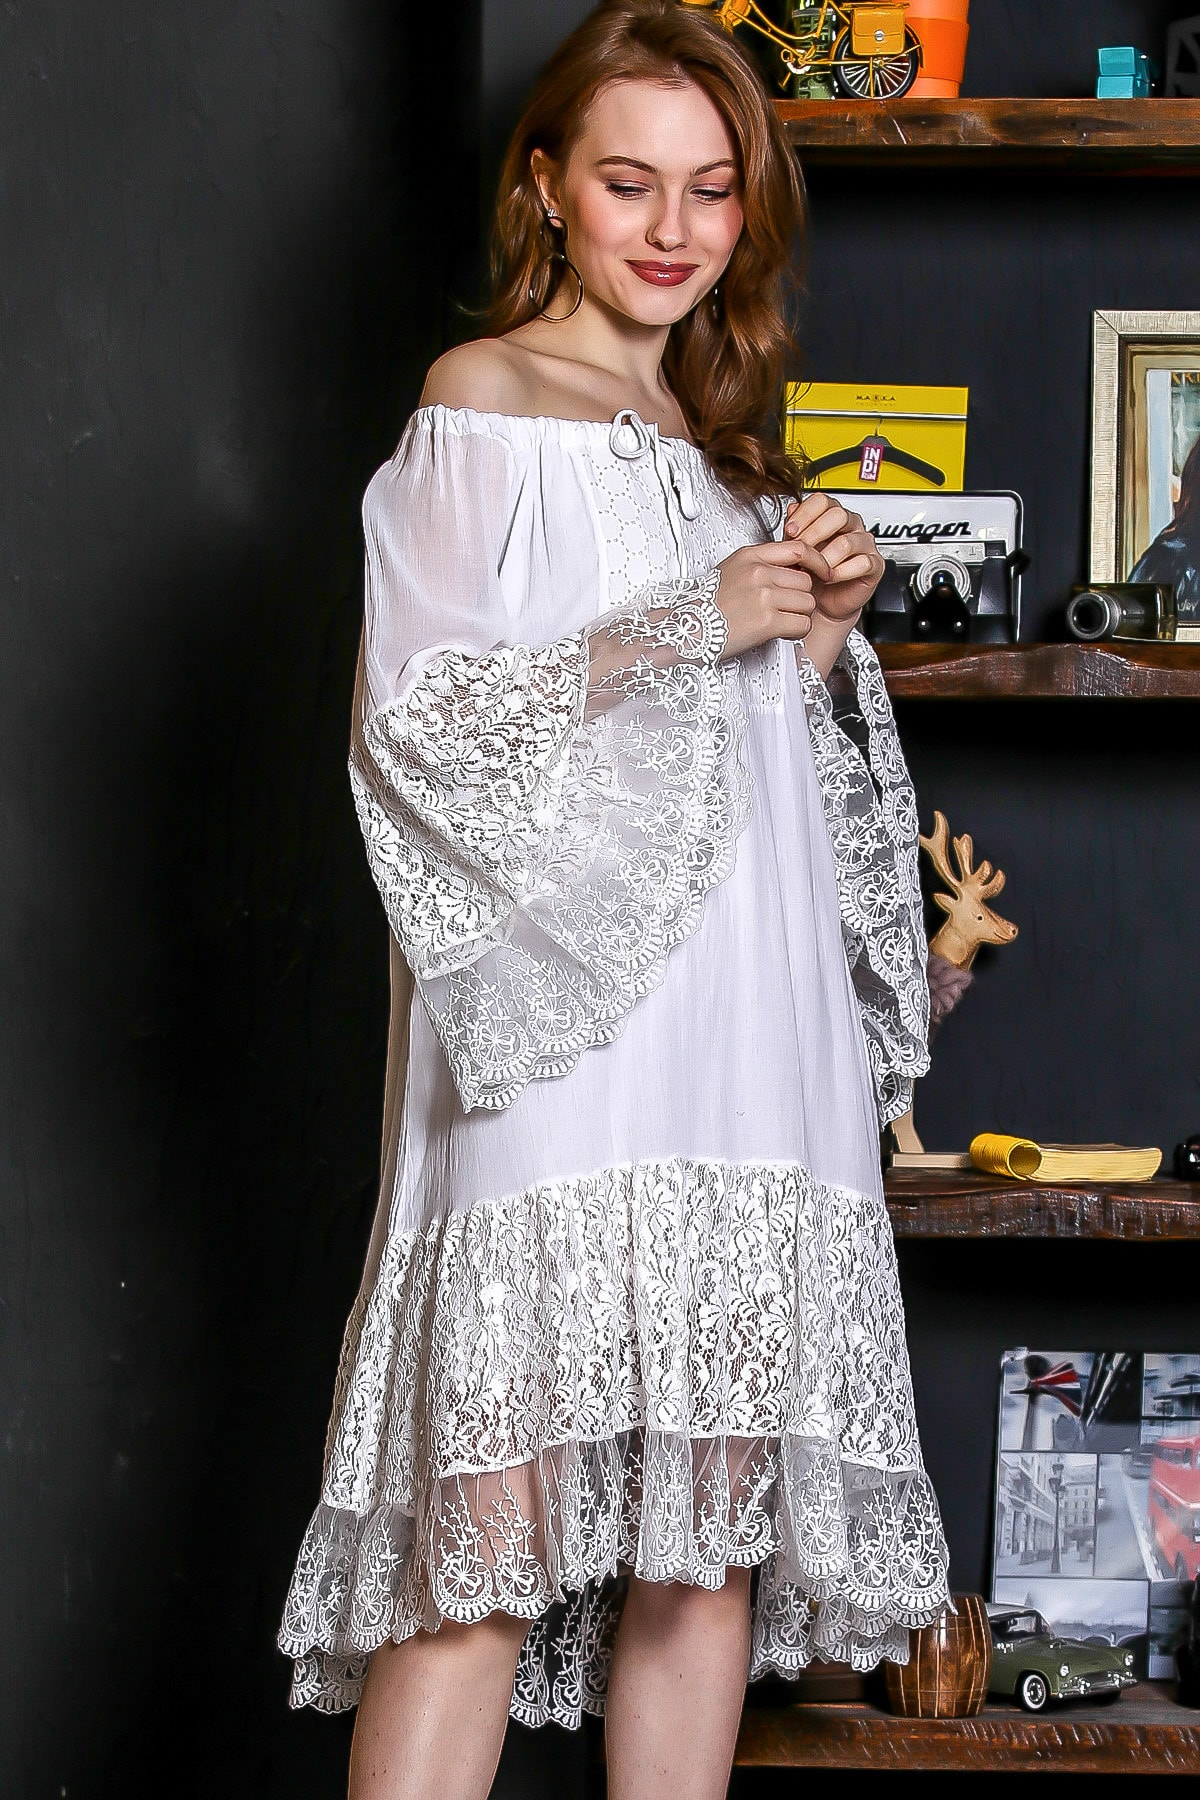 Chiccy Kadın Beyaz Carmen Yaka İspanyol Kol Dantel Detaylı Astarlı Salaş Midi Elbise M10160000EL95240